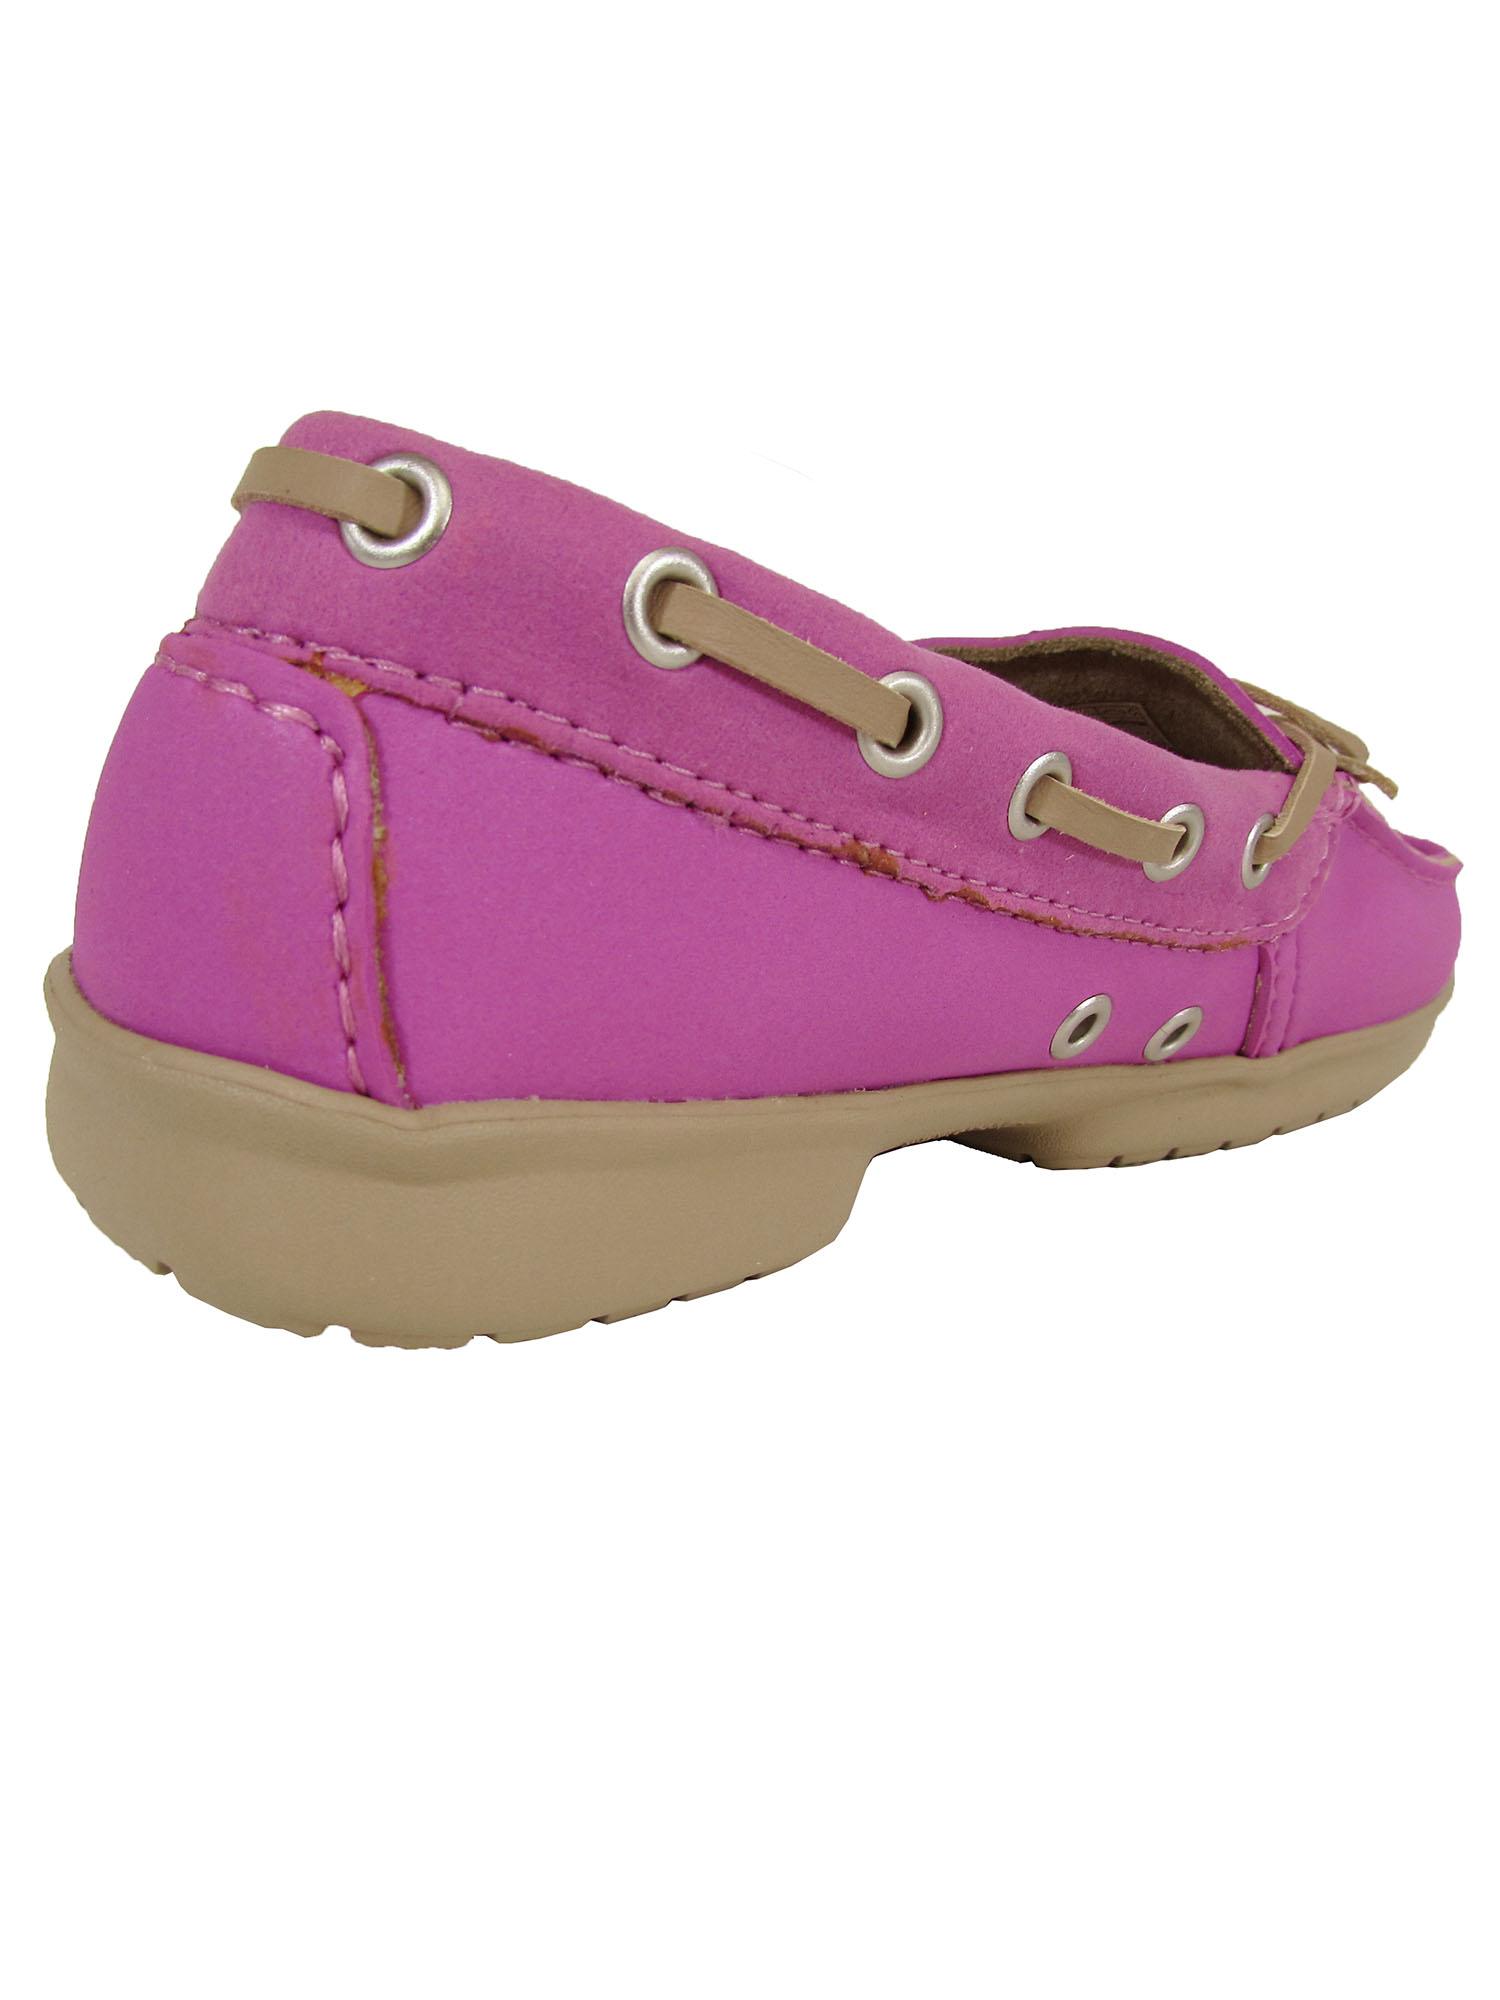 Crocs-Womens-Wrap-ColorLite-Loafer-Shoes thumbnail 22